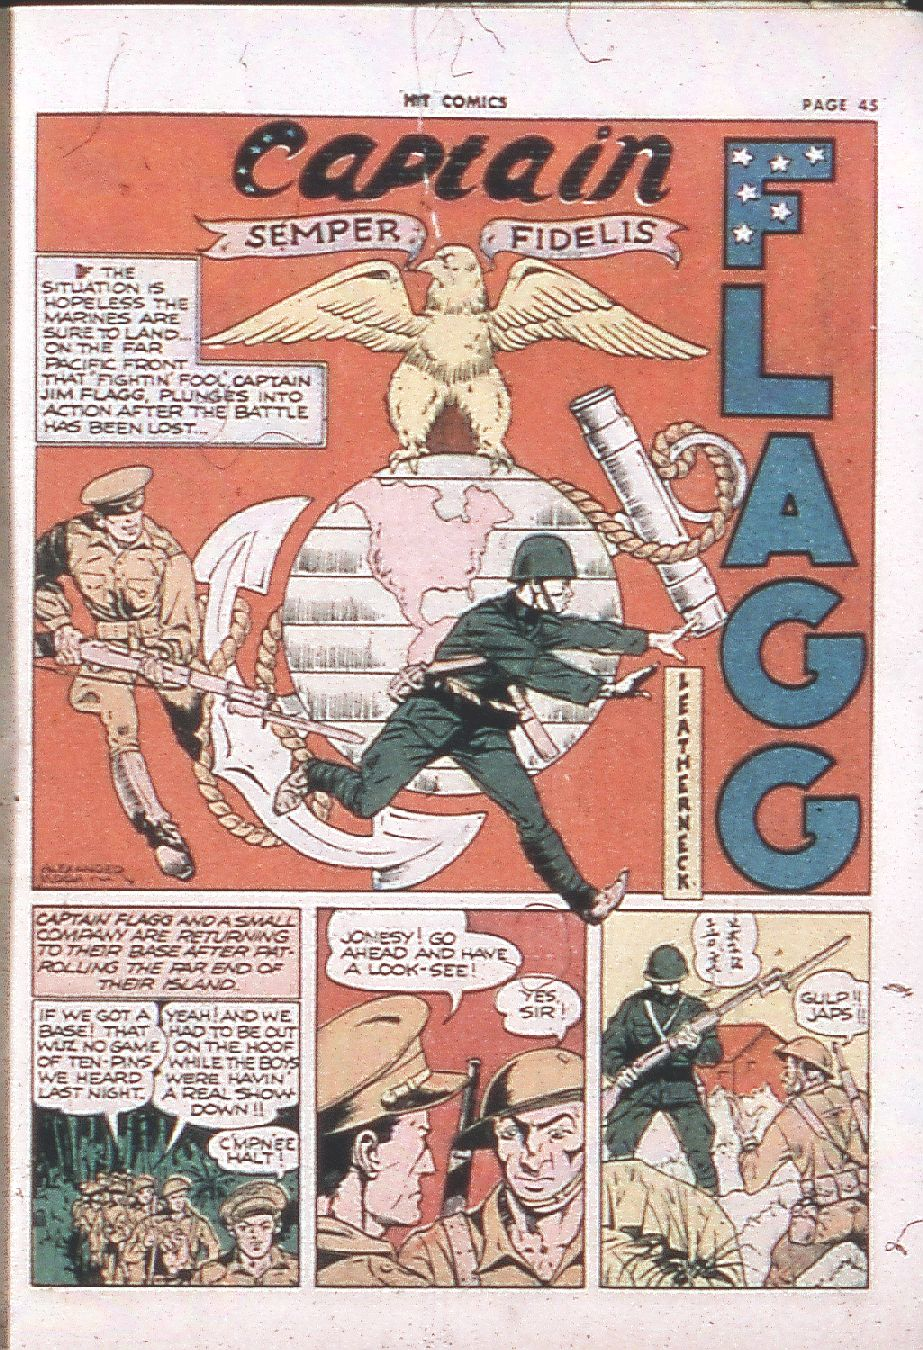 Read online Hit Comics comic -  Issue #24 - 47